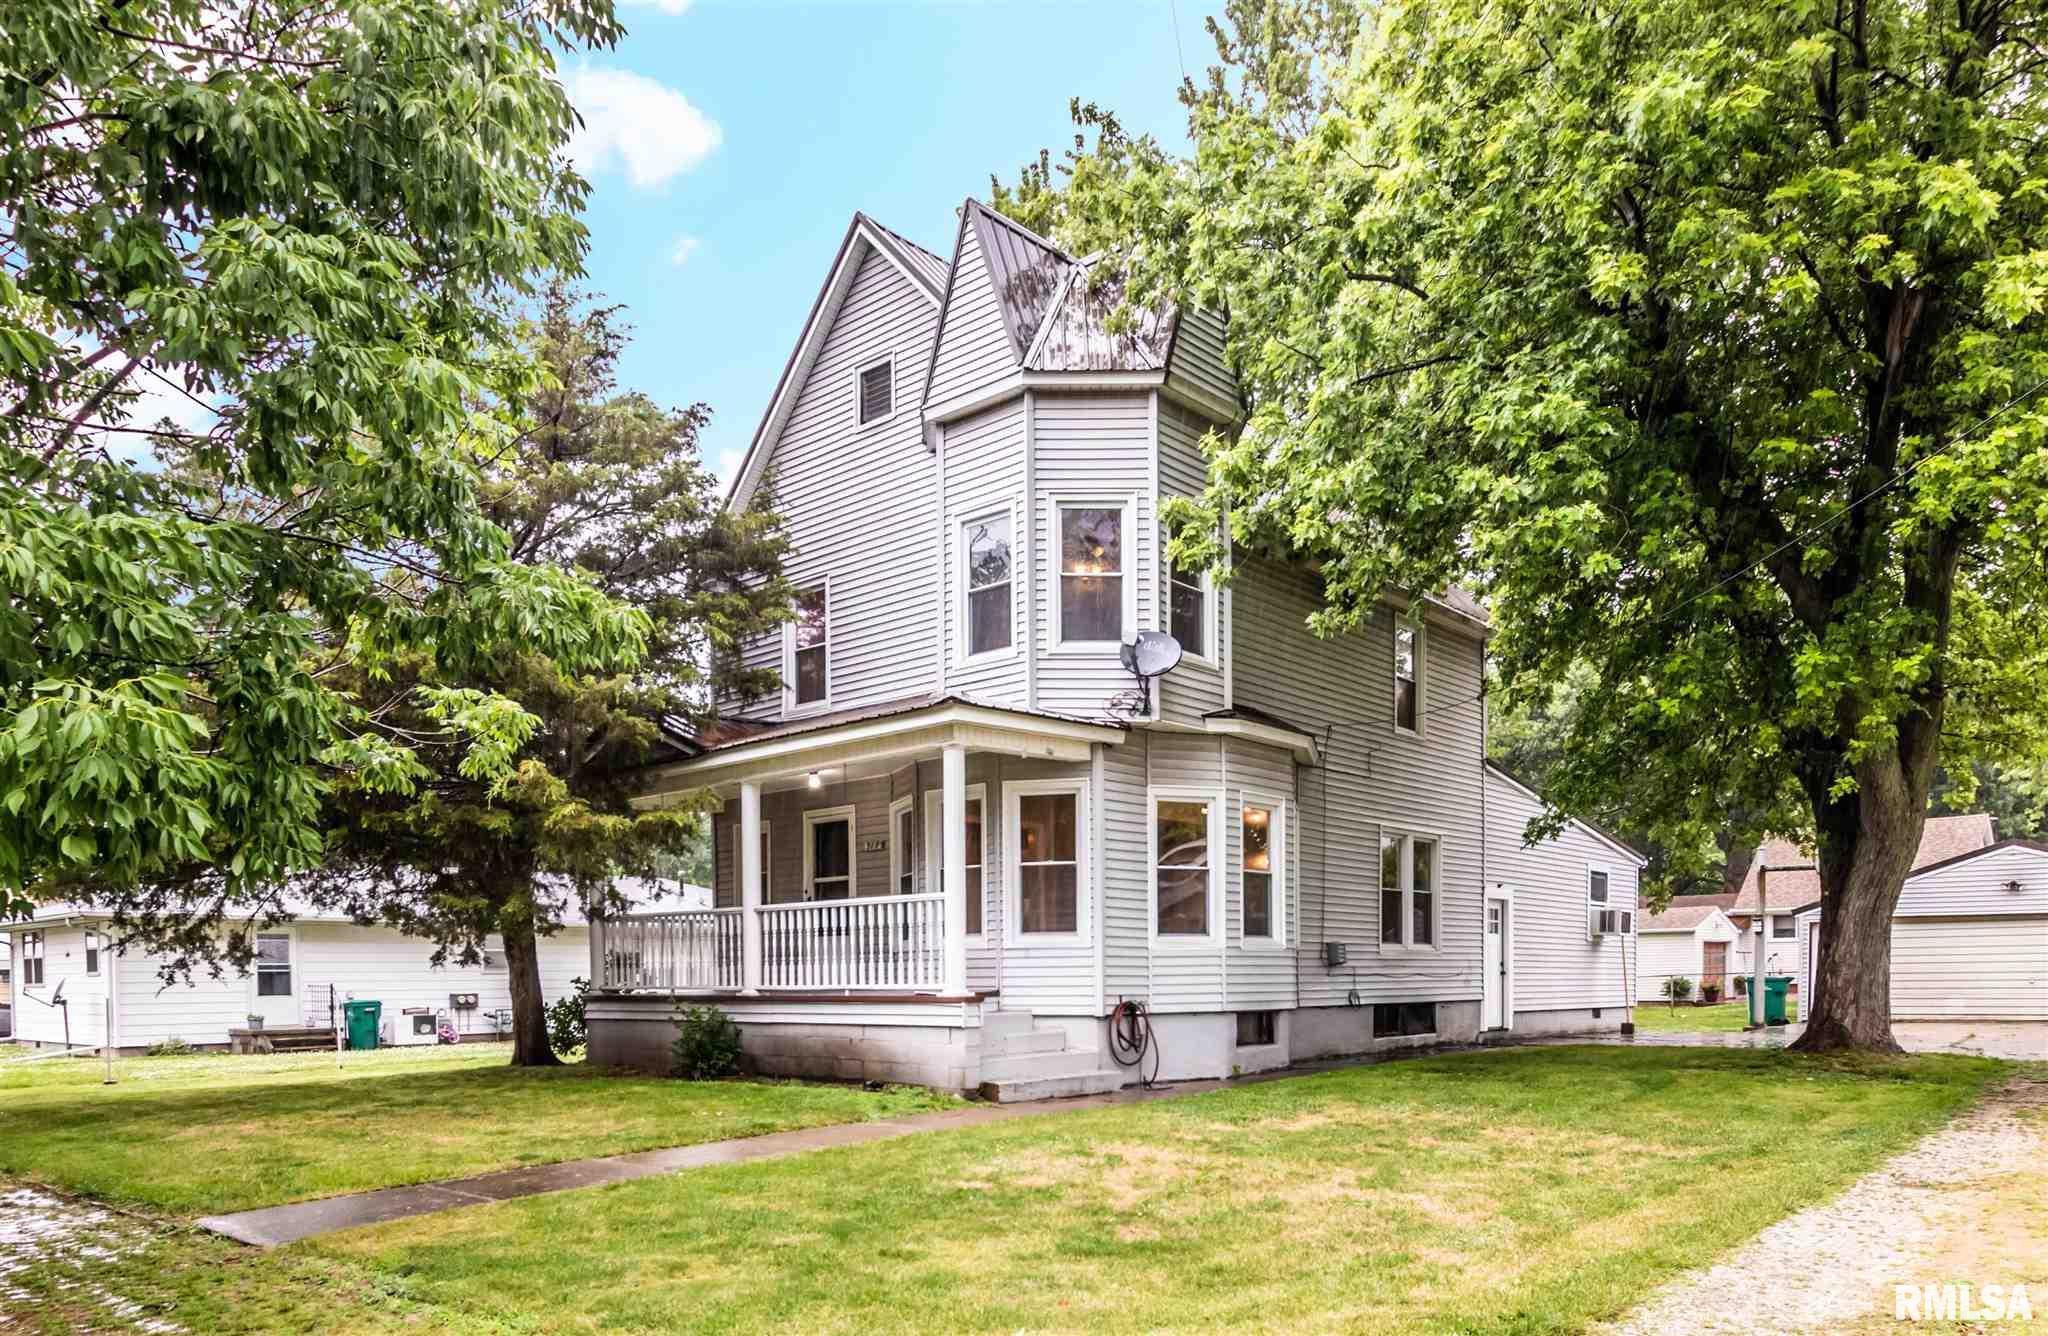 319 W FULTON Property Photo - Farmington, IL real estate listing